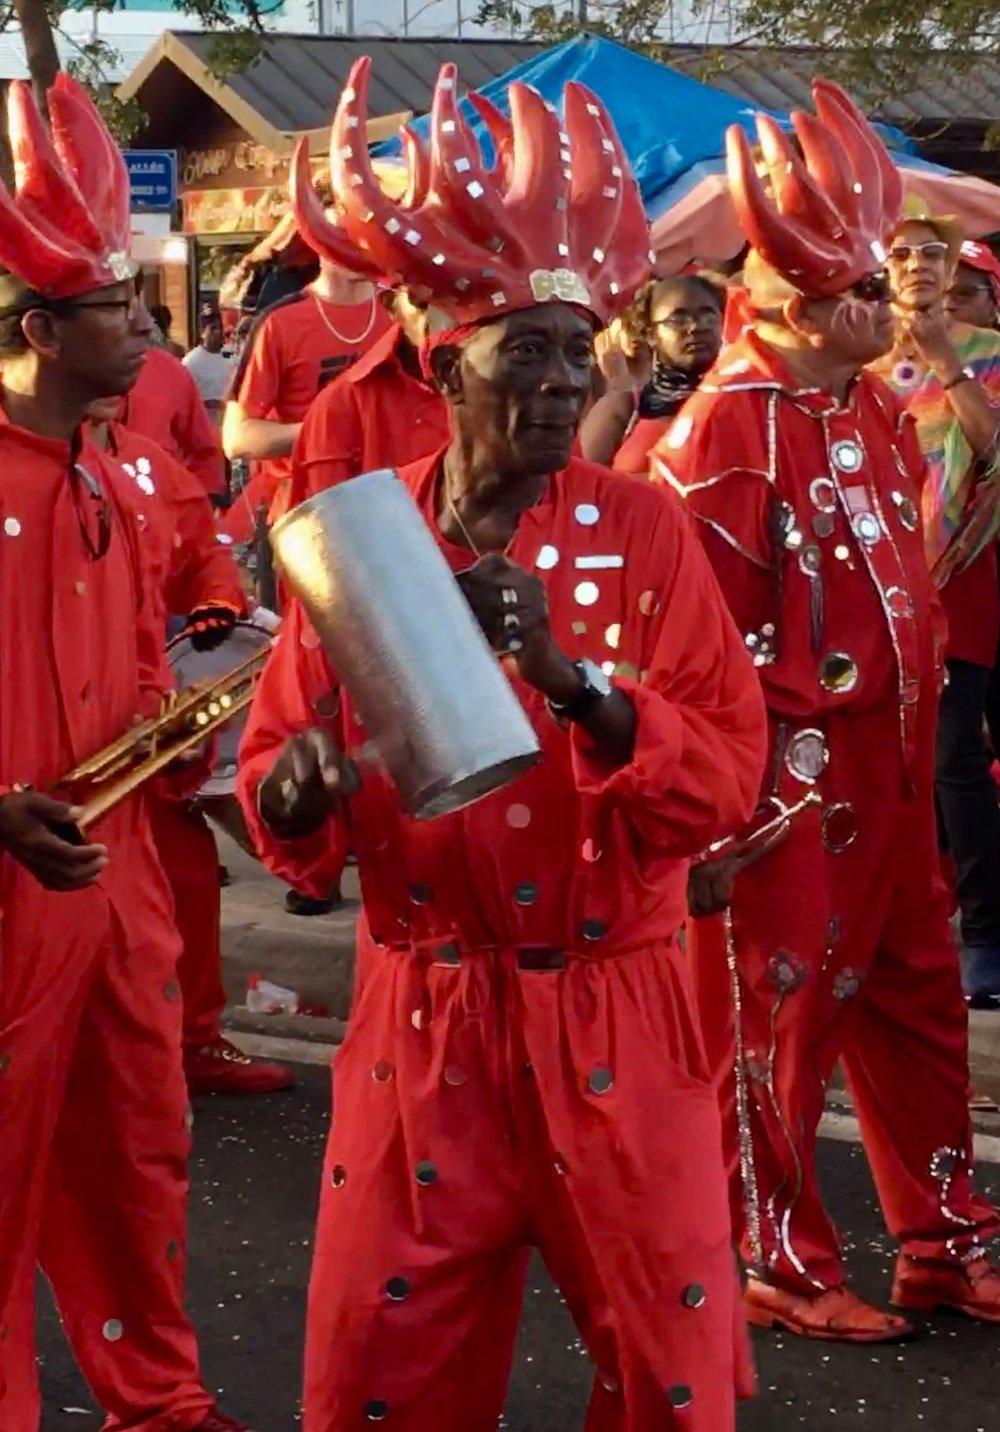 carnaval-musician-martinique.jpg